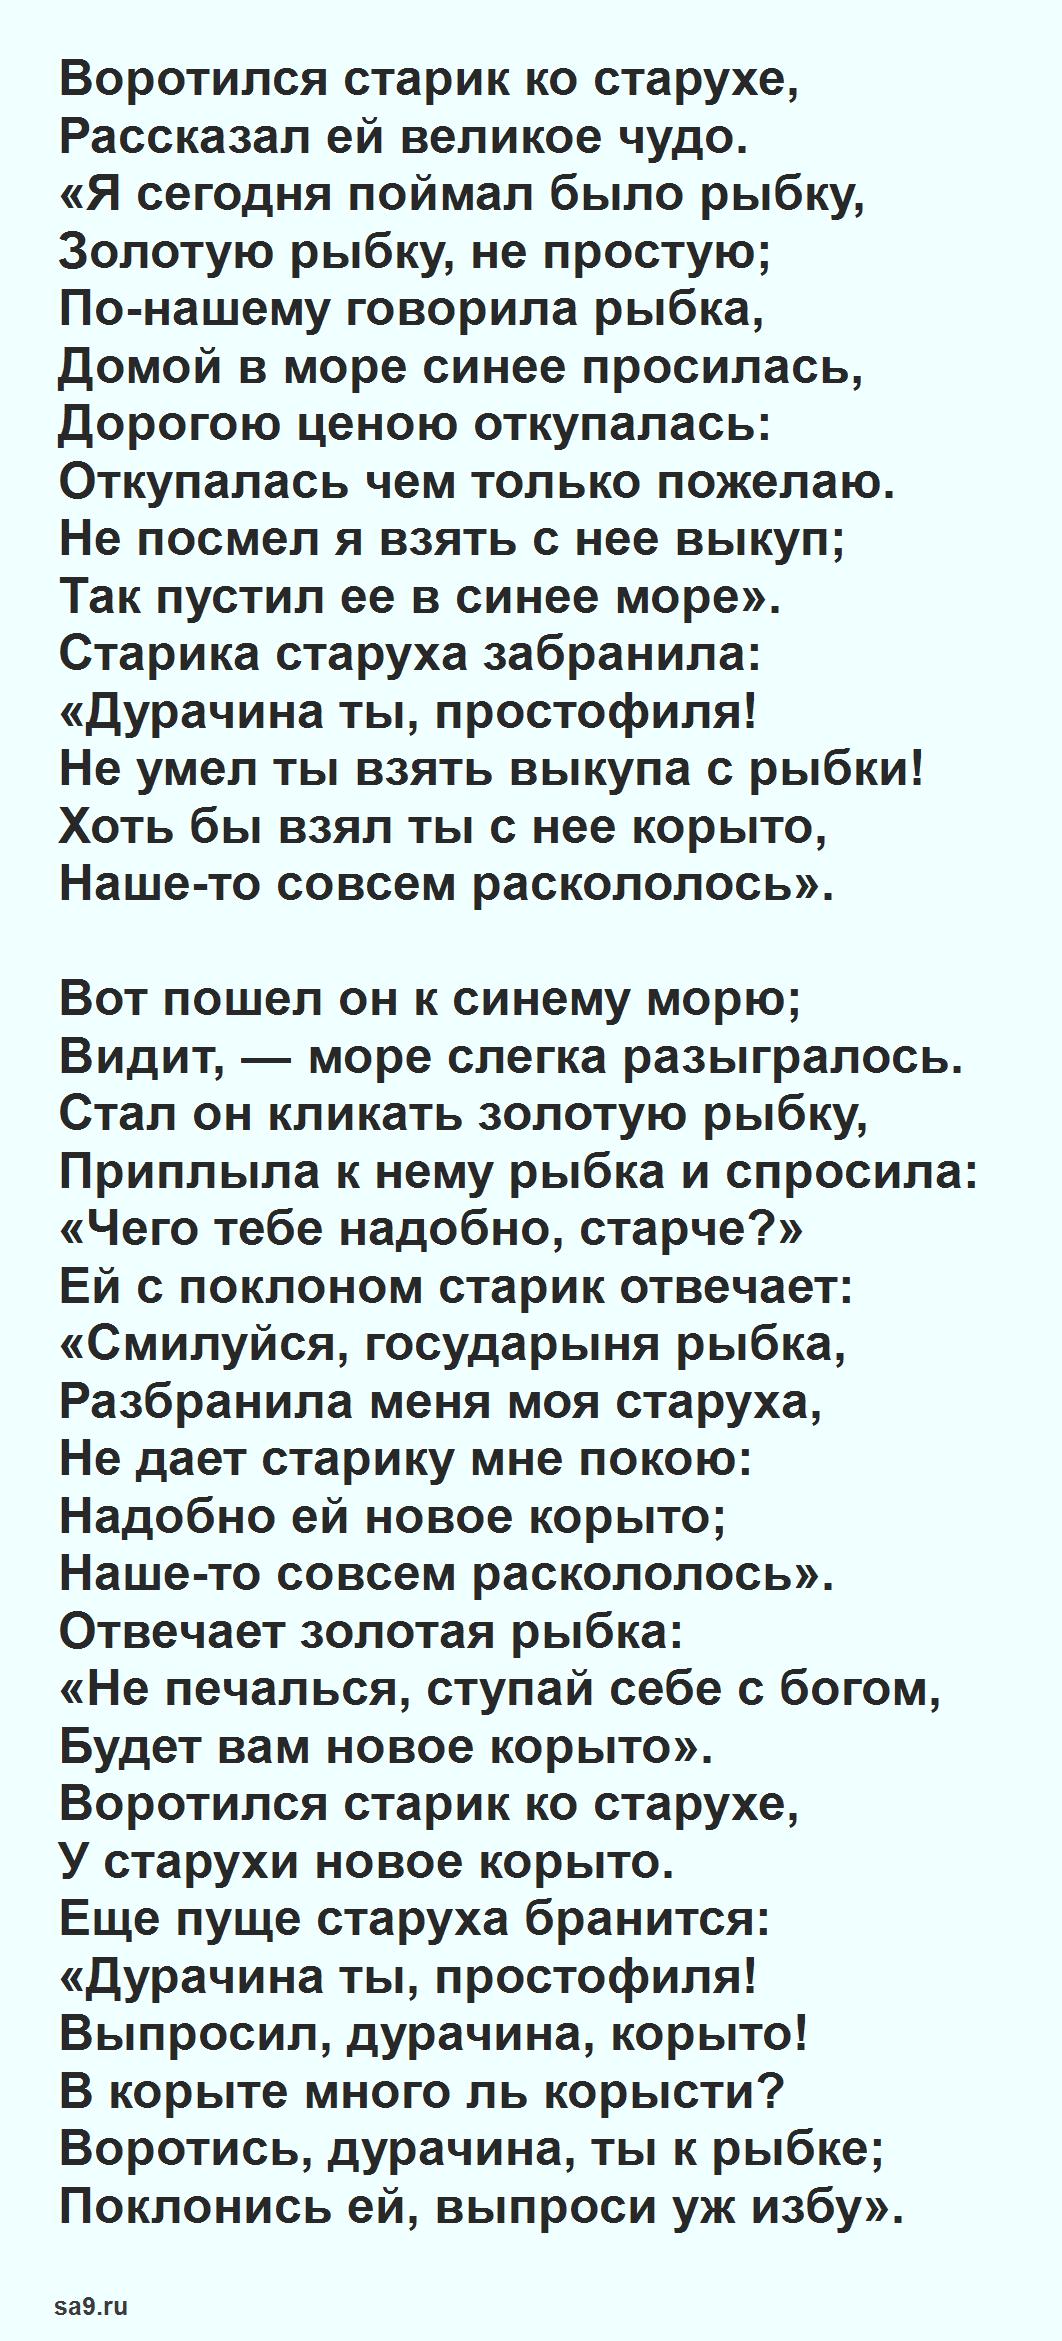 Пушкин сказка 'О рыбаке и рыбке'